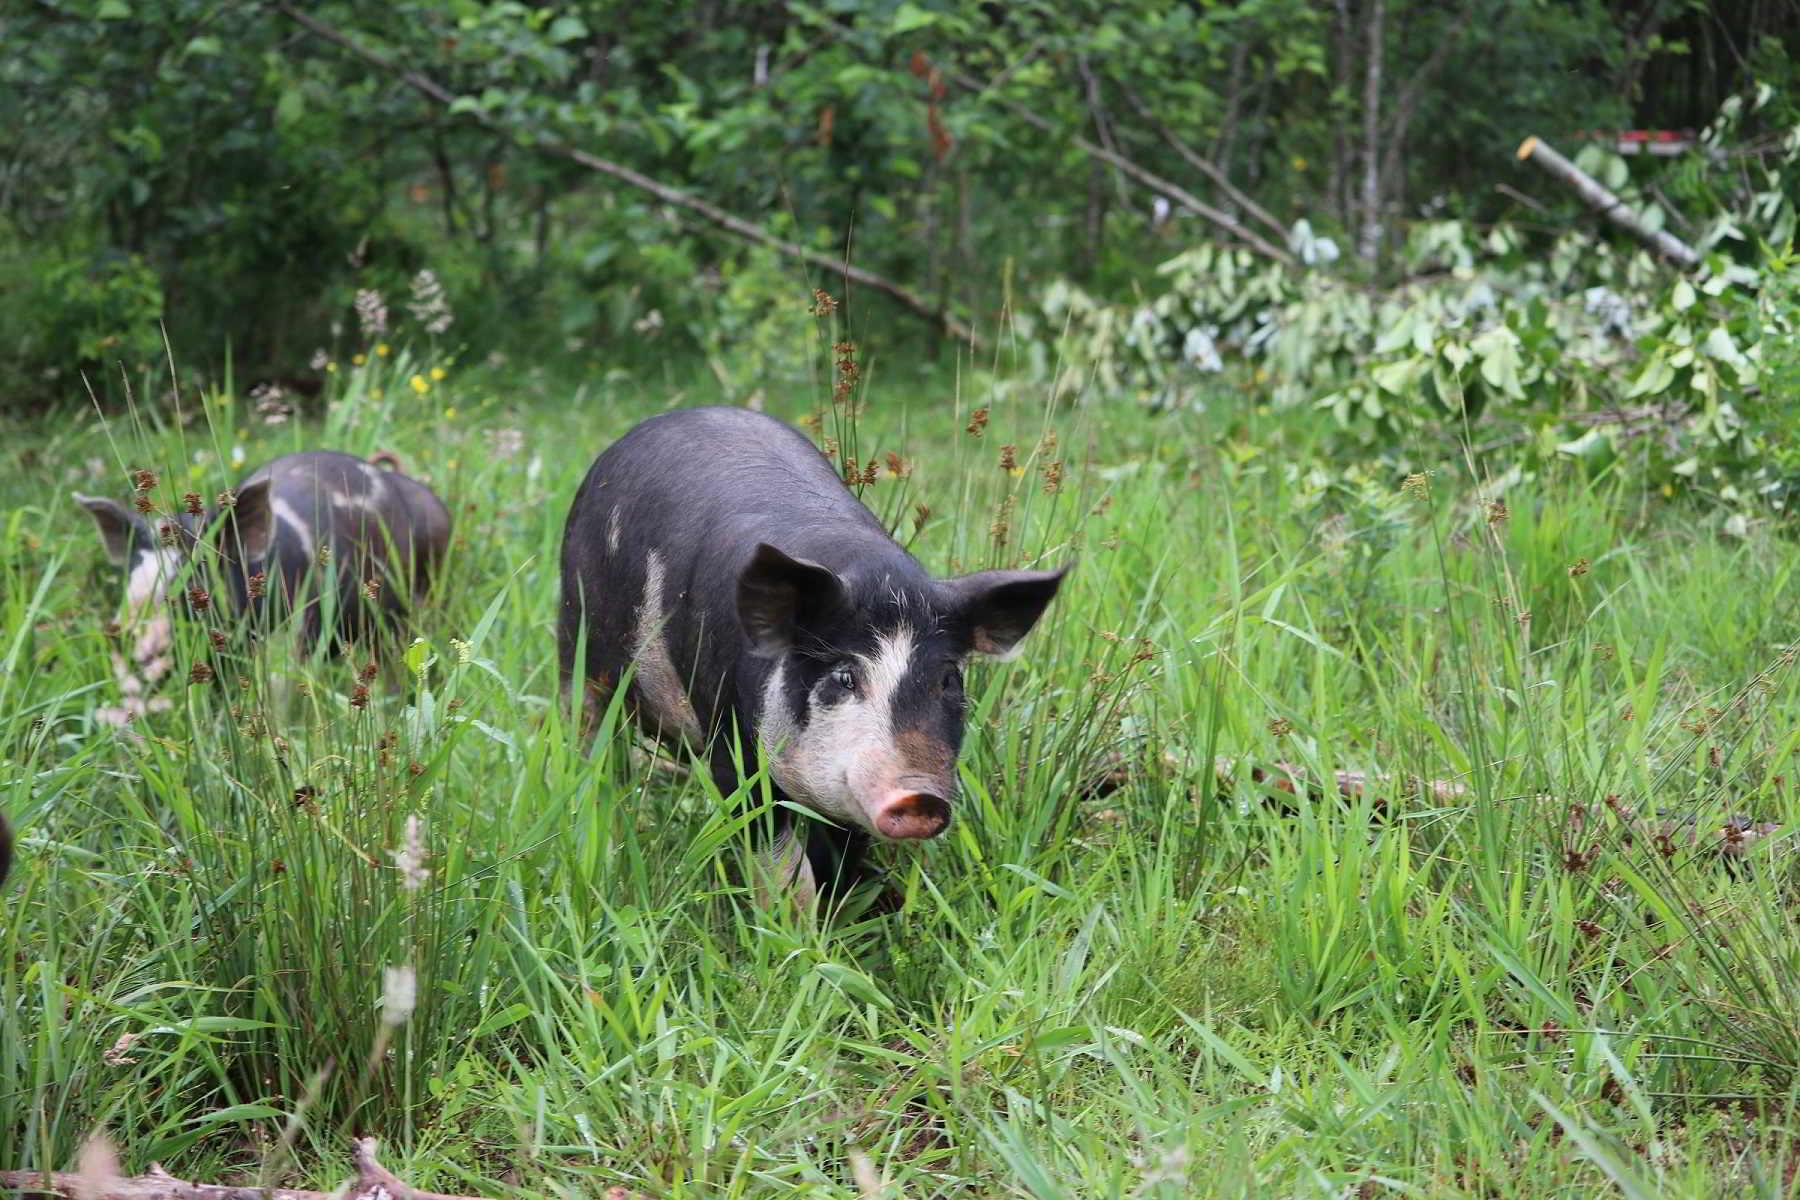 Lost Savanna Farm pig in June